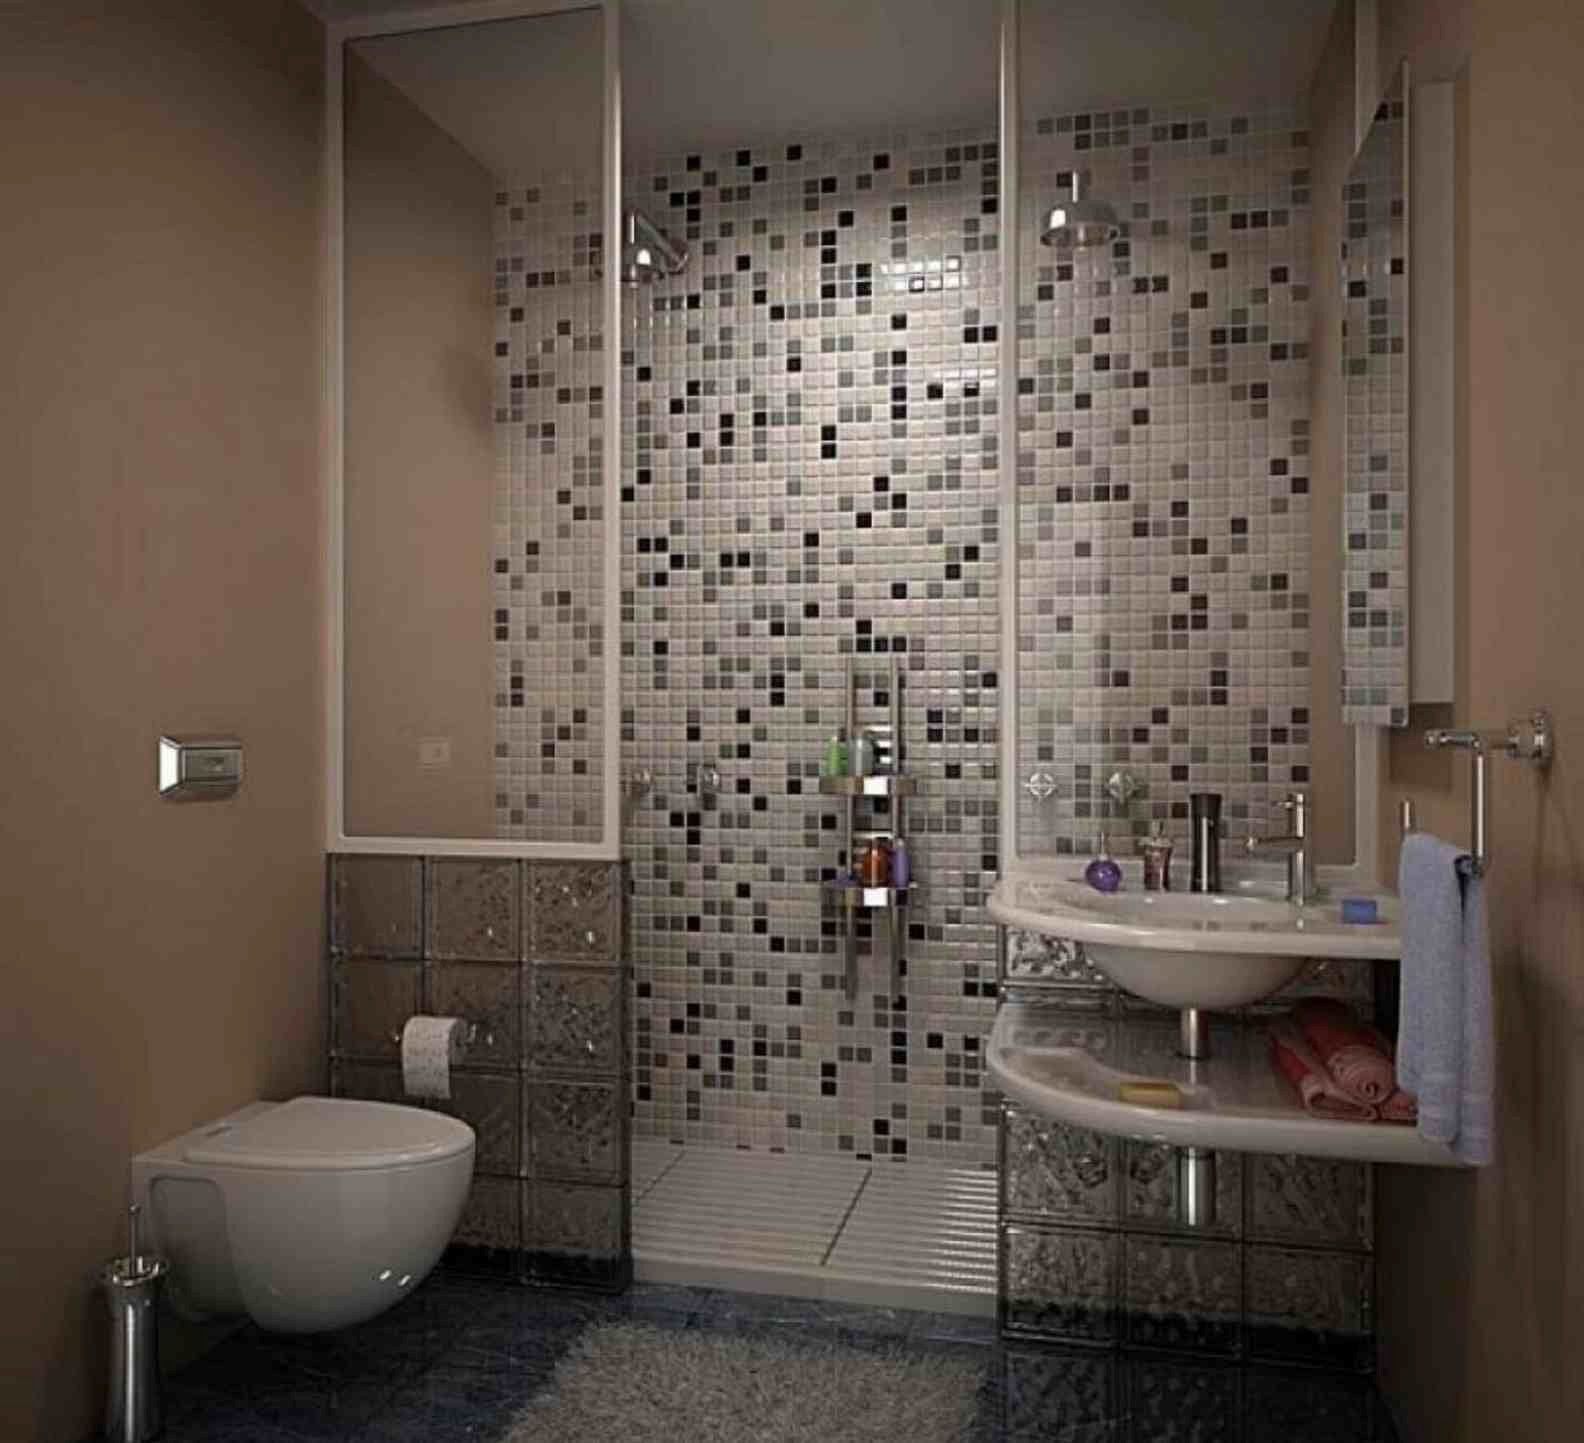 small bathroom tiles design philippines archives - bathroom design